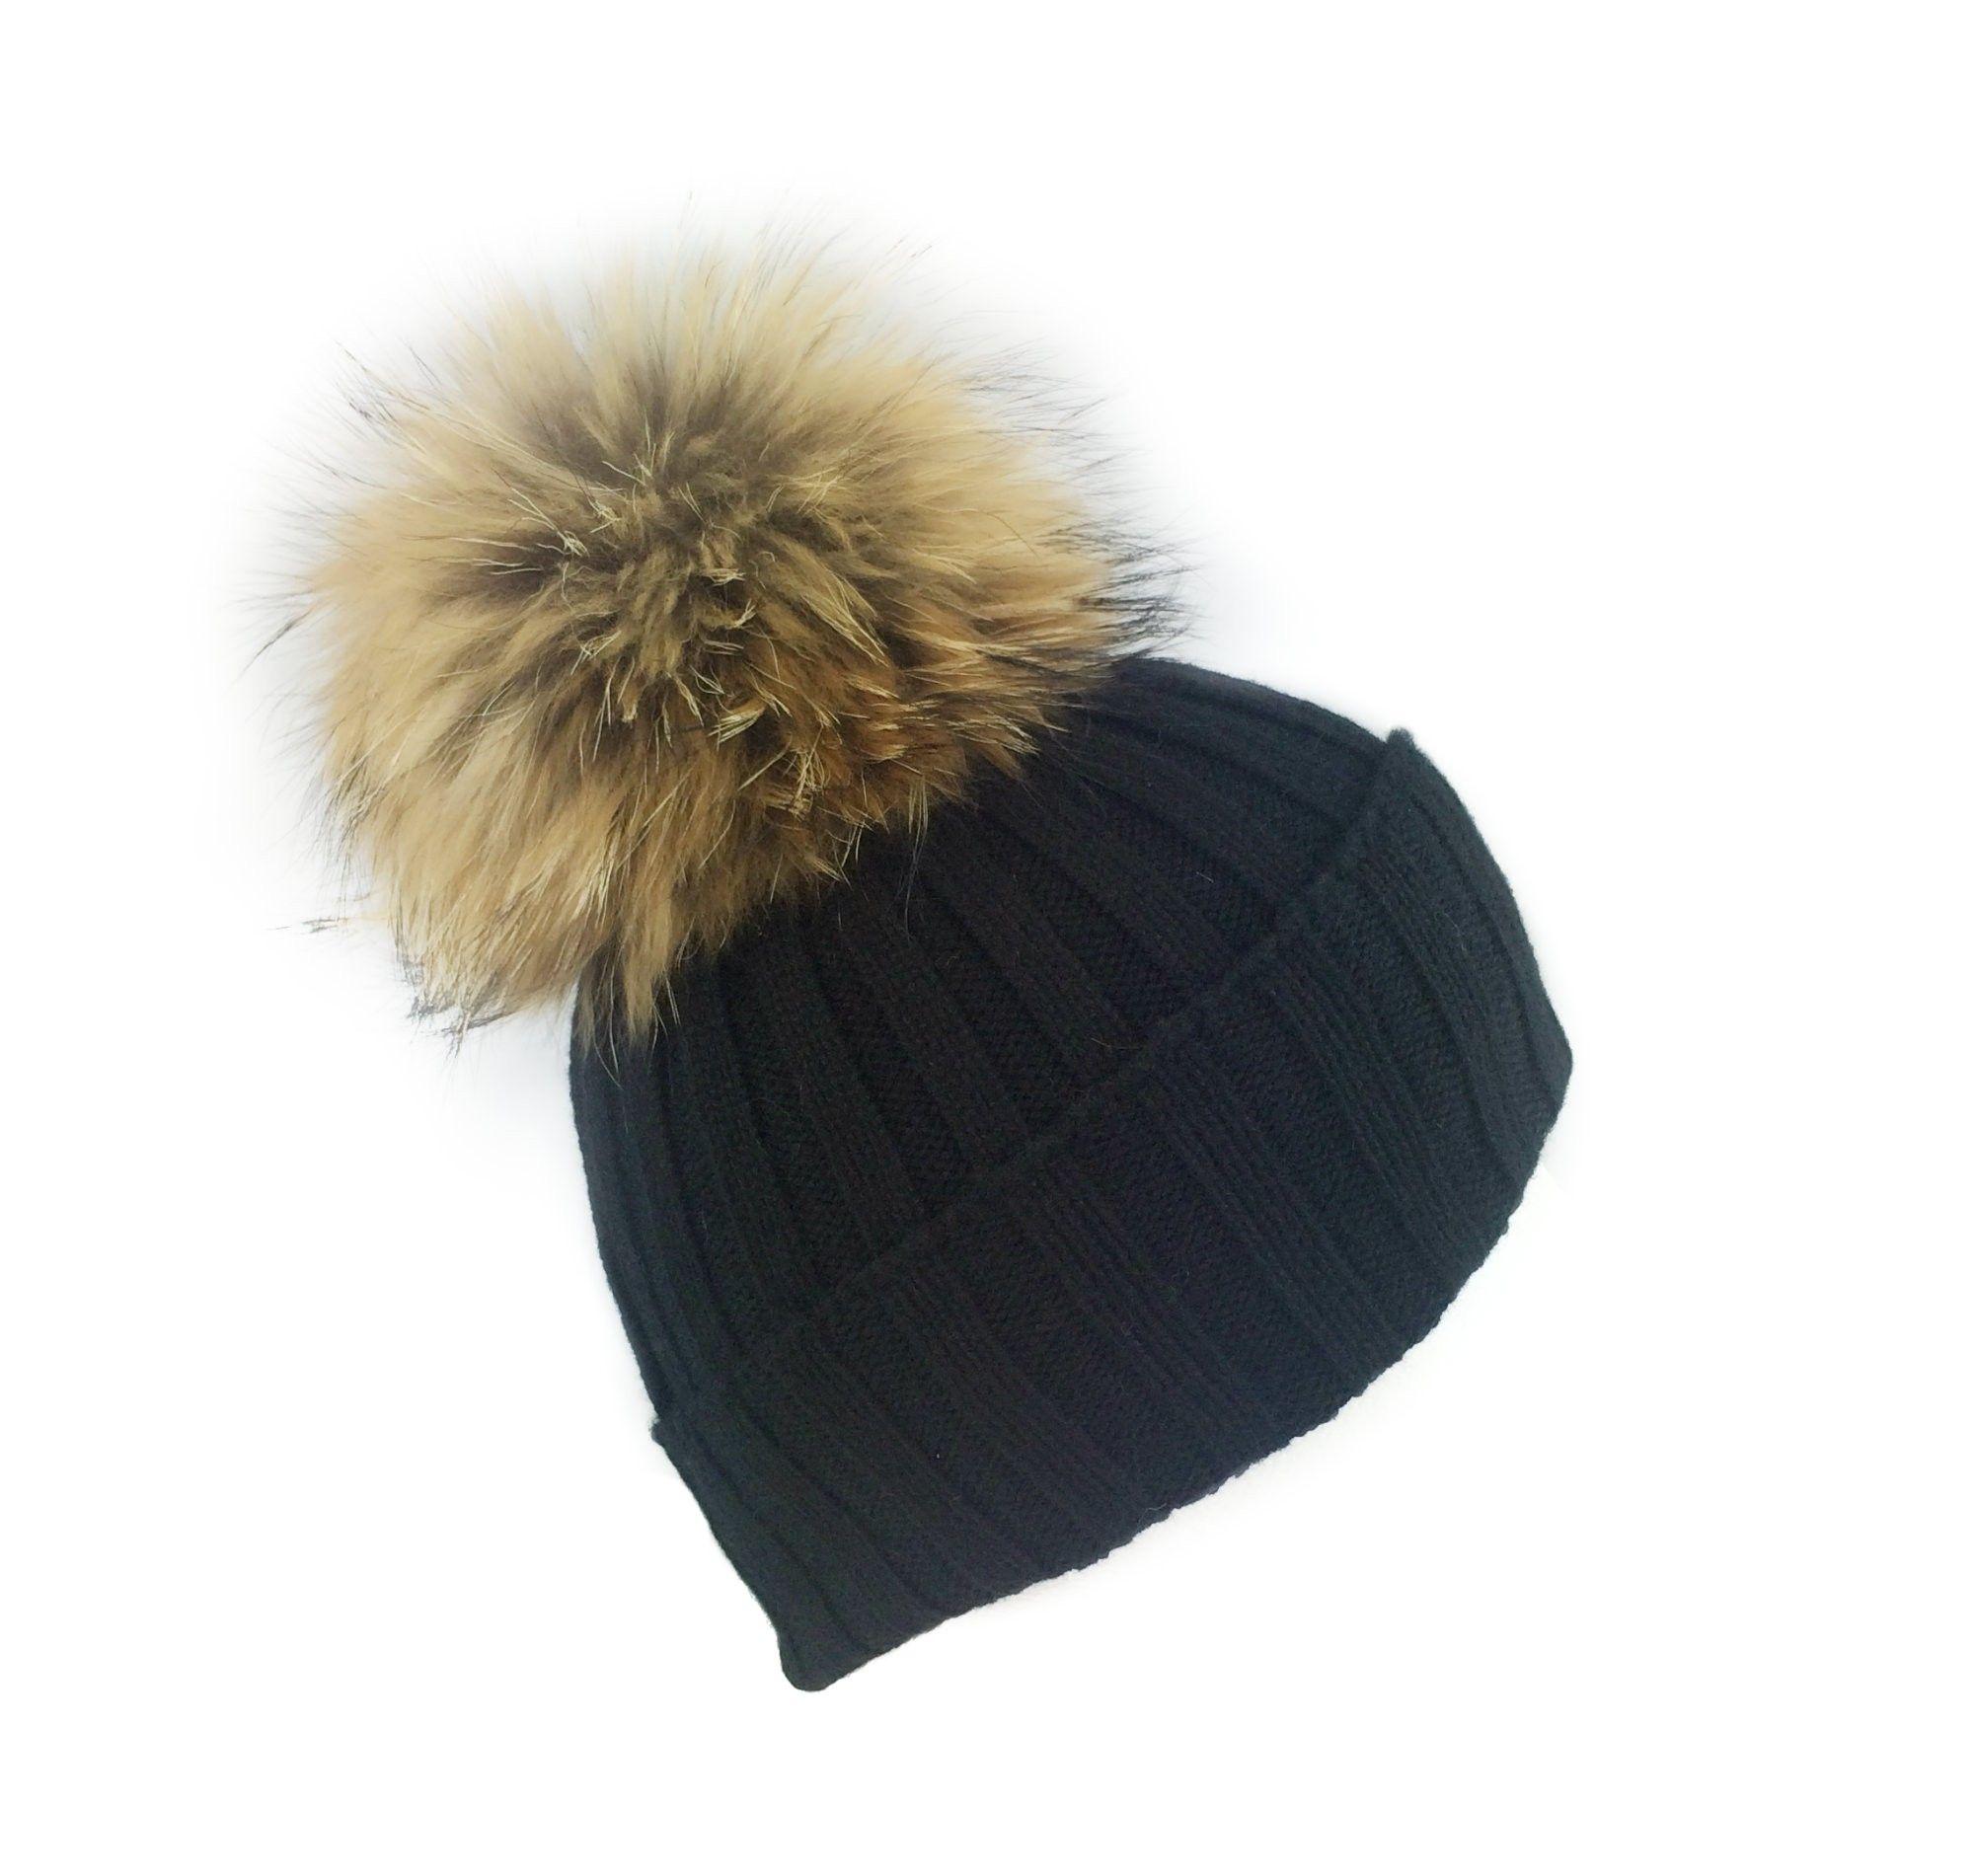 dba15b67784 noughtsandkisses Black Giant Fur Bobble Hat